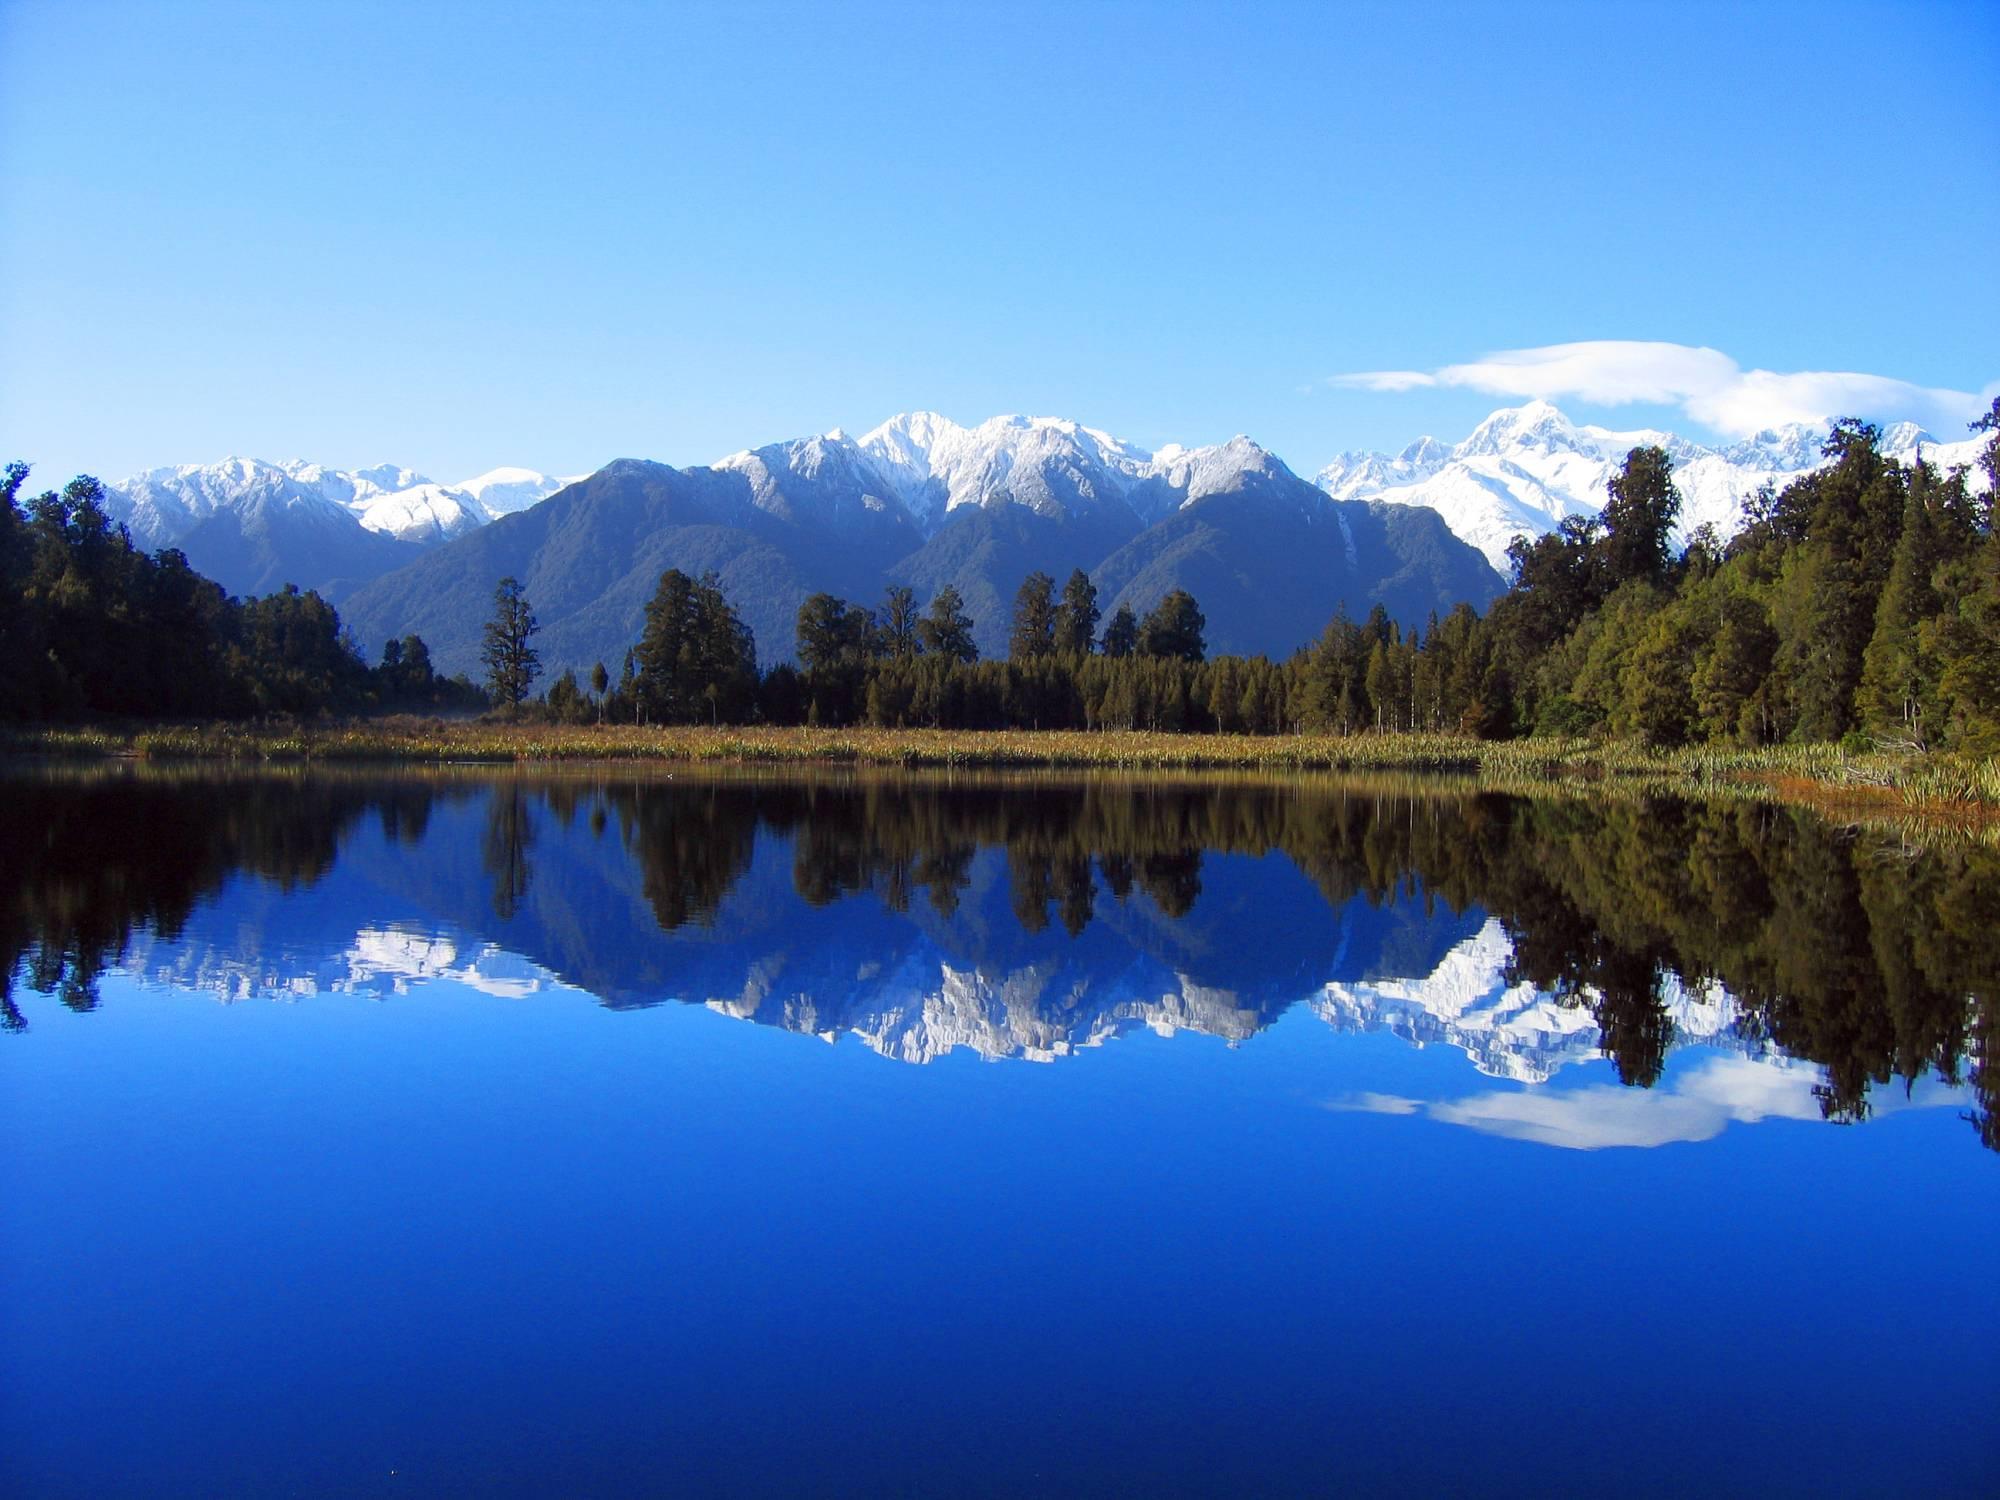 High Resolution Wallpaper   Lake Matheson 2000x1500 px